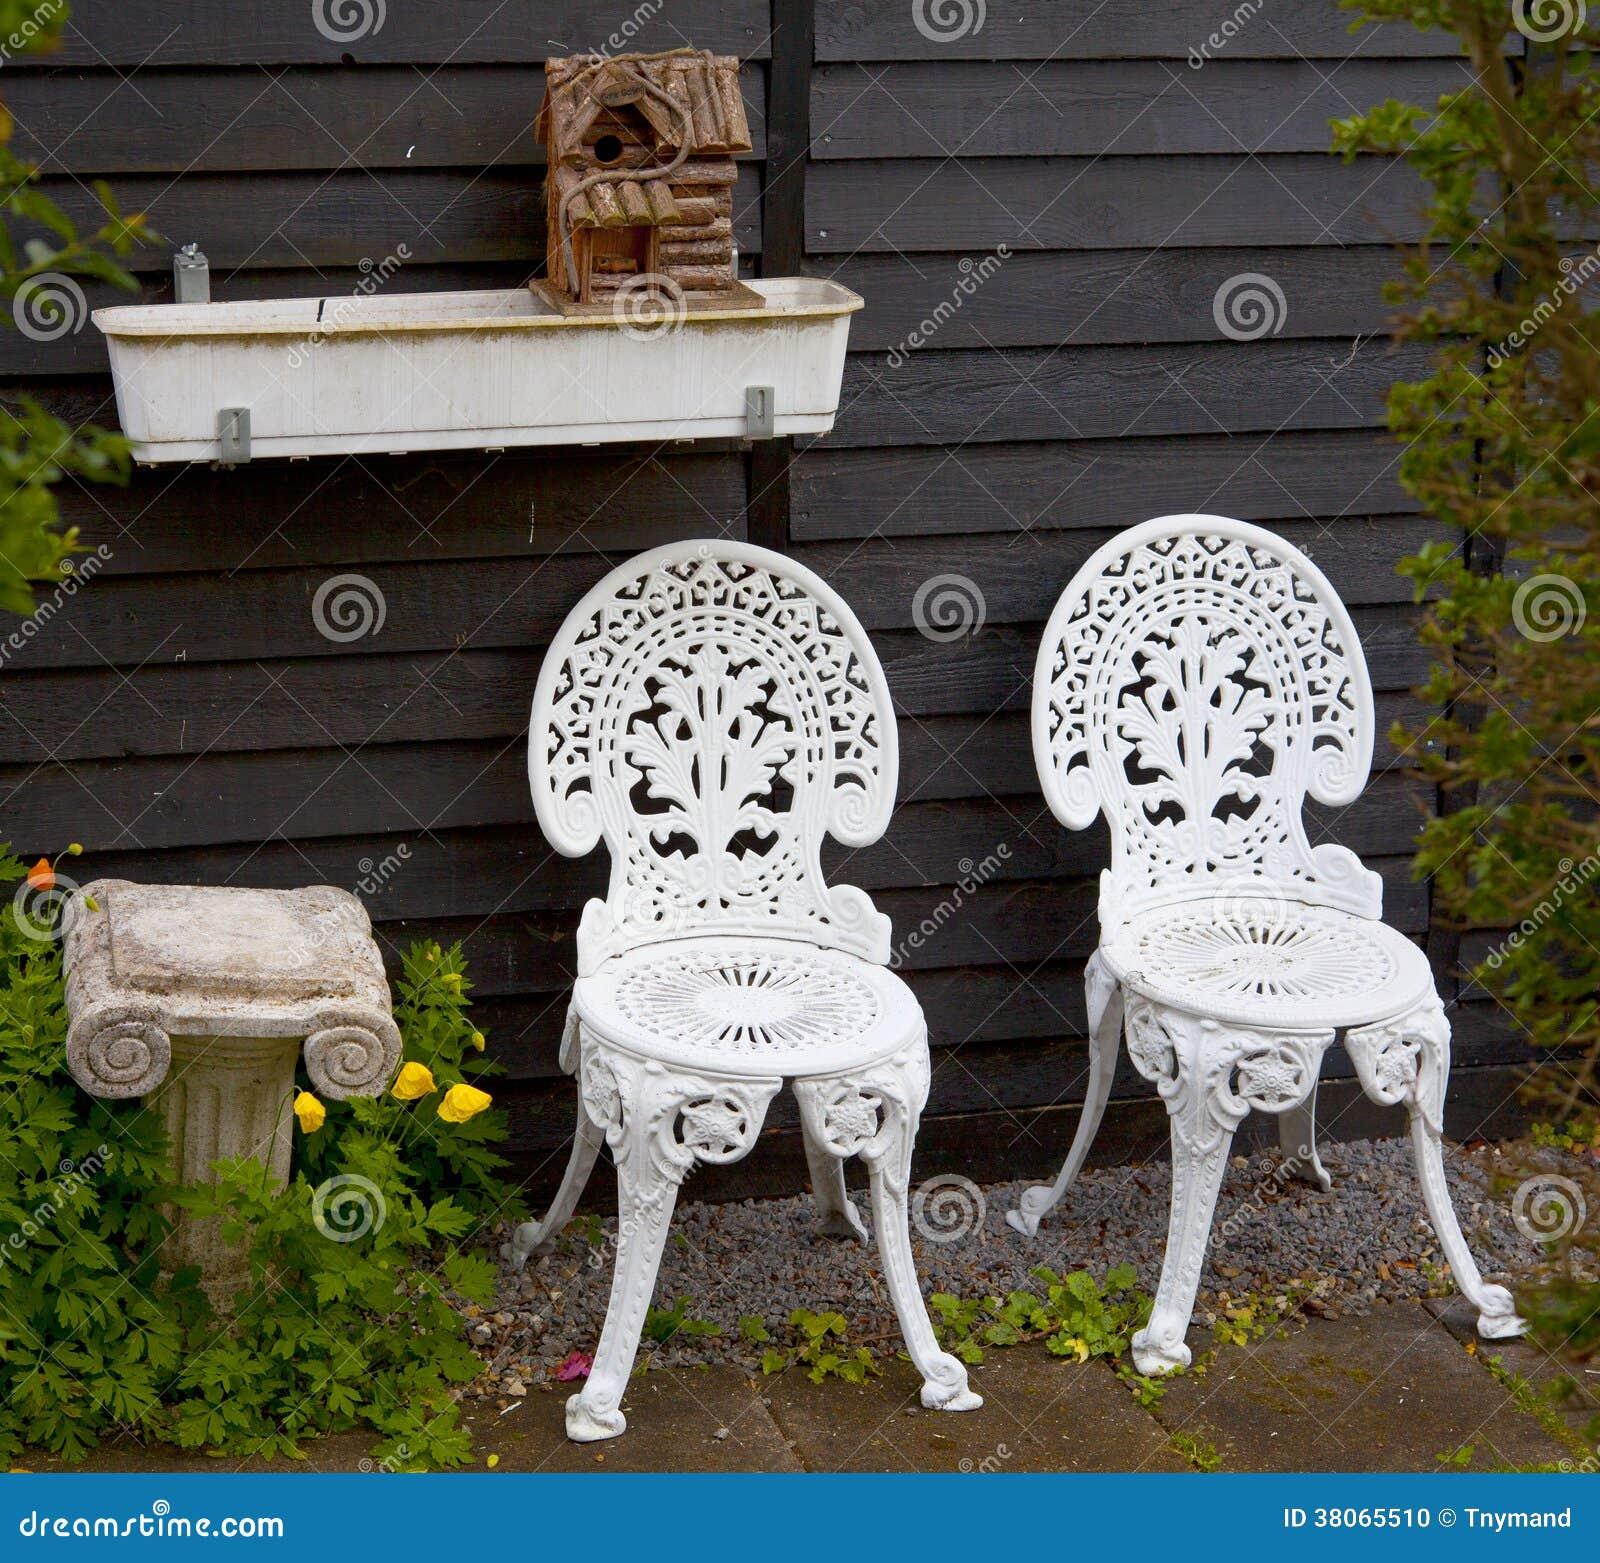 White metal garden chairs - White Metal Garden Chairs Next To Small Column And Birdhouse Stock Photo